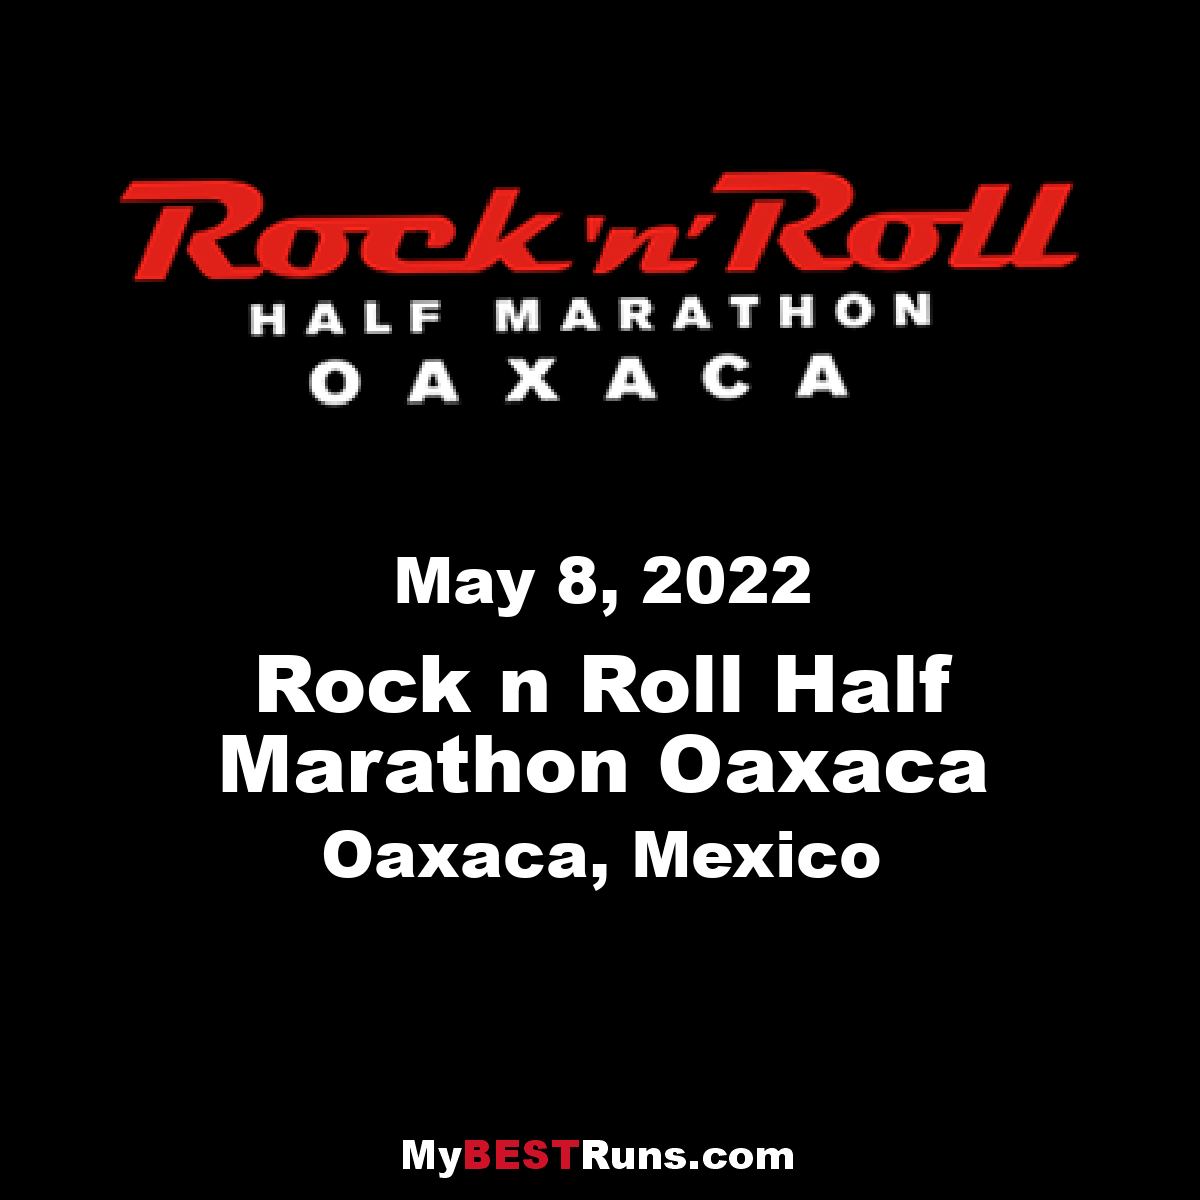 Rock n Roll Half Marathon Oaxaca